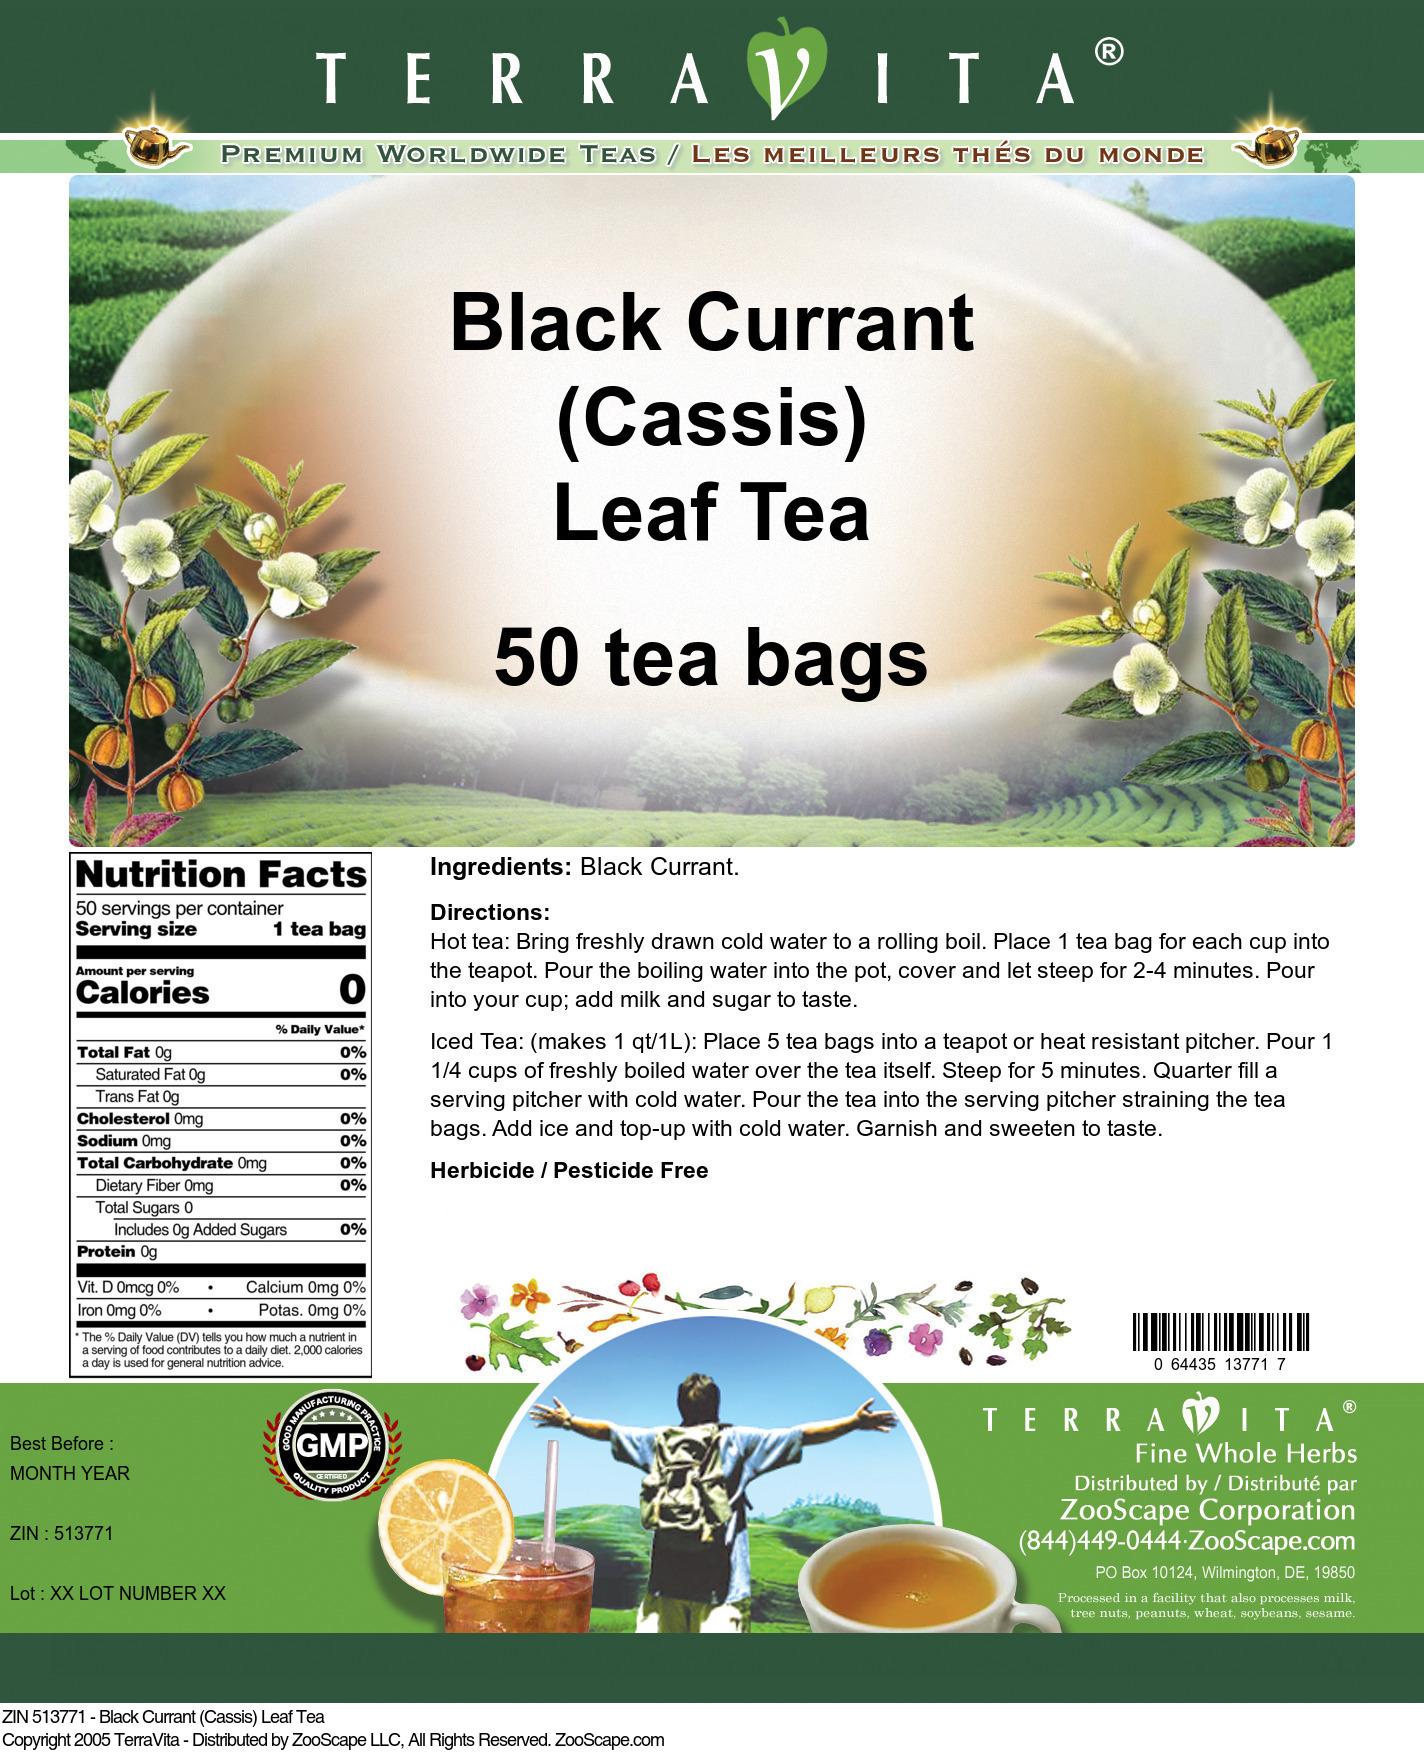 Black Currant (Cassis) Leaf Tea